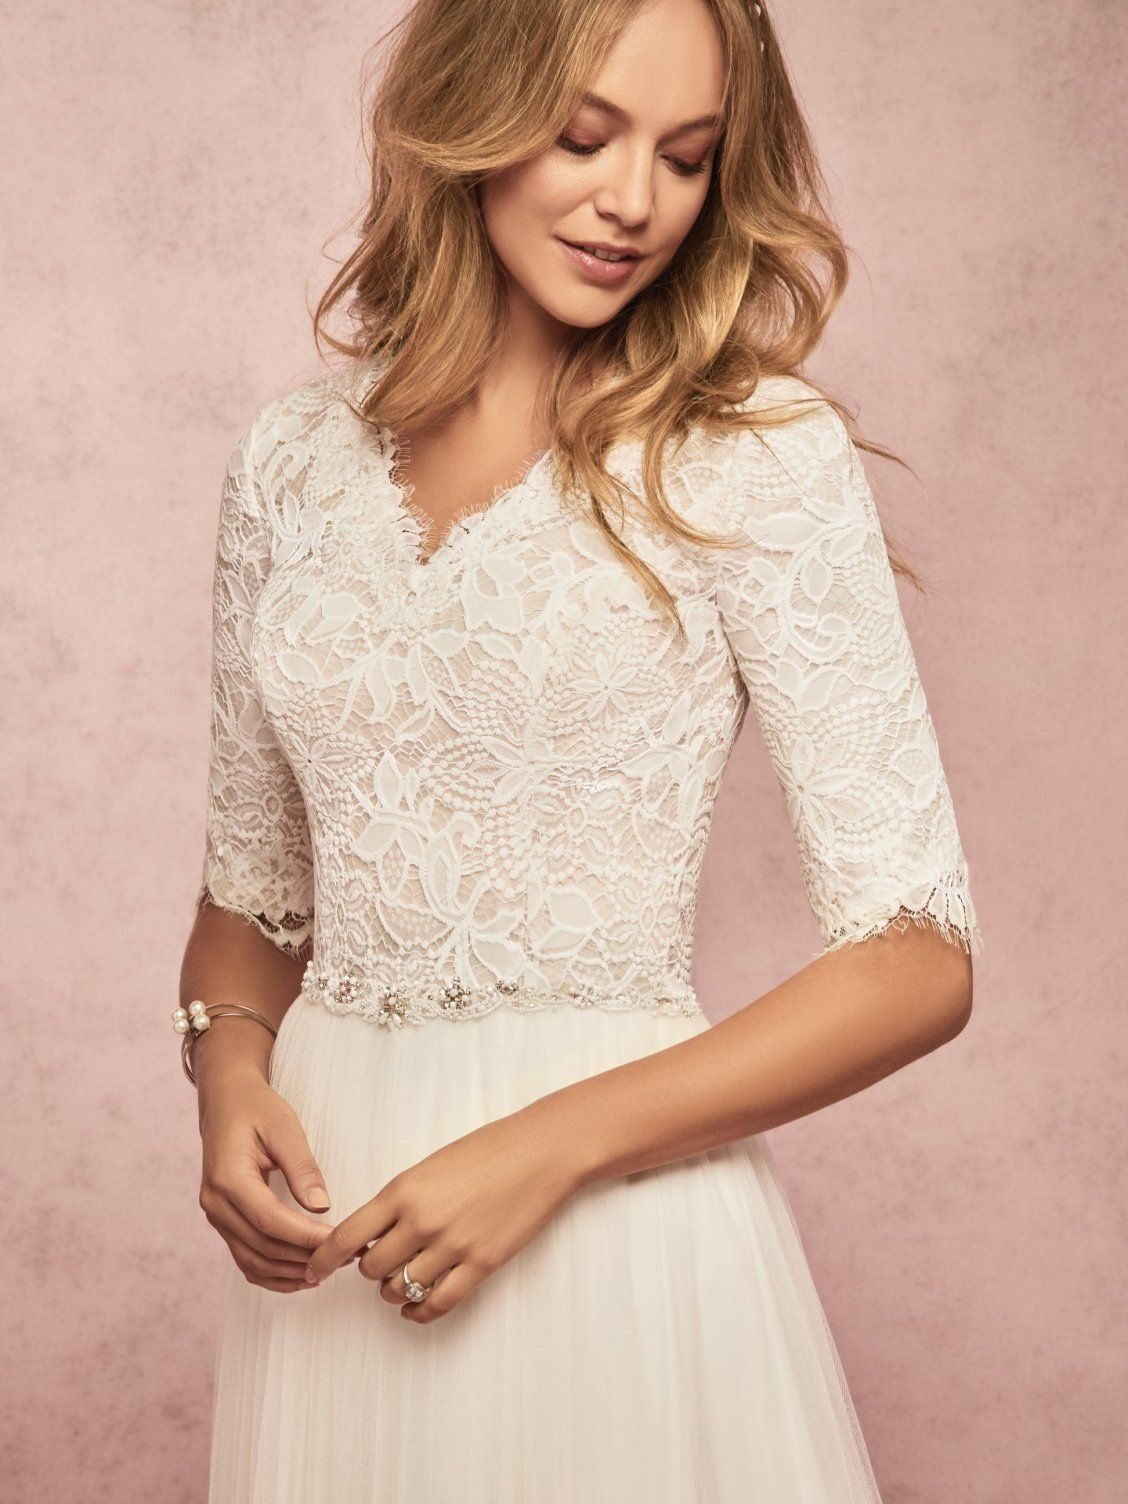 Connie Leigh By Rebecca Ingram Wedding Dresses Wedding Dresses Lace Wedding Dress Long Sleeve Modest Wedding Dresses